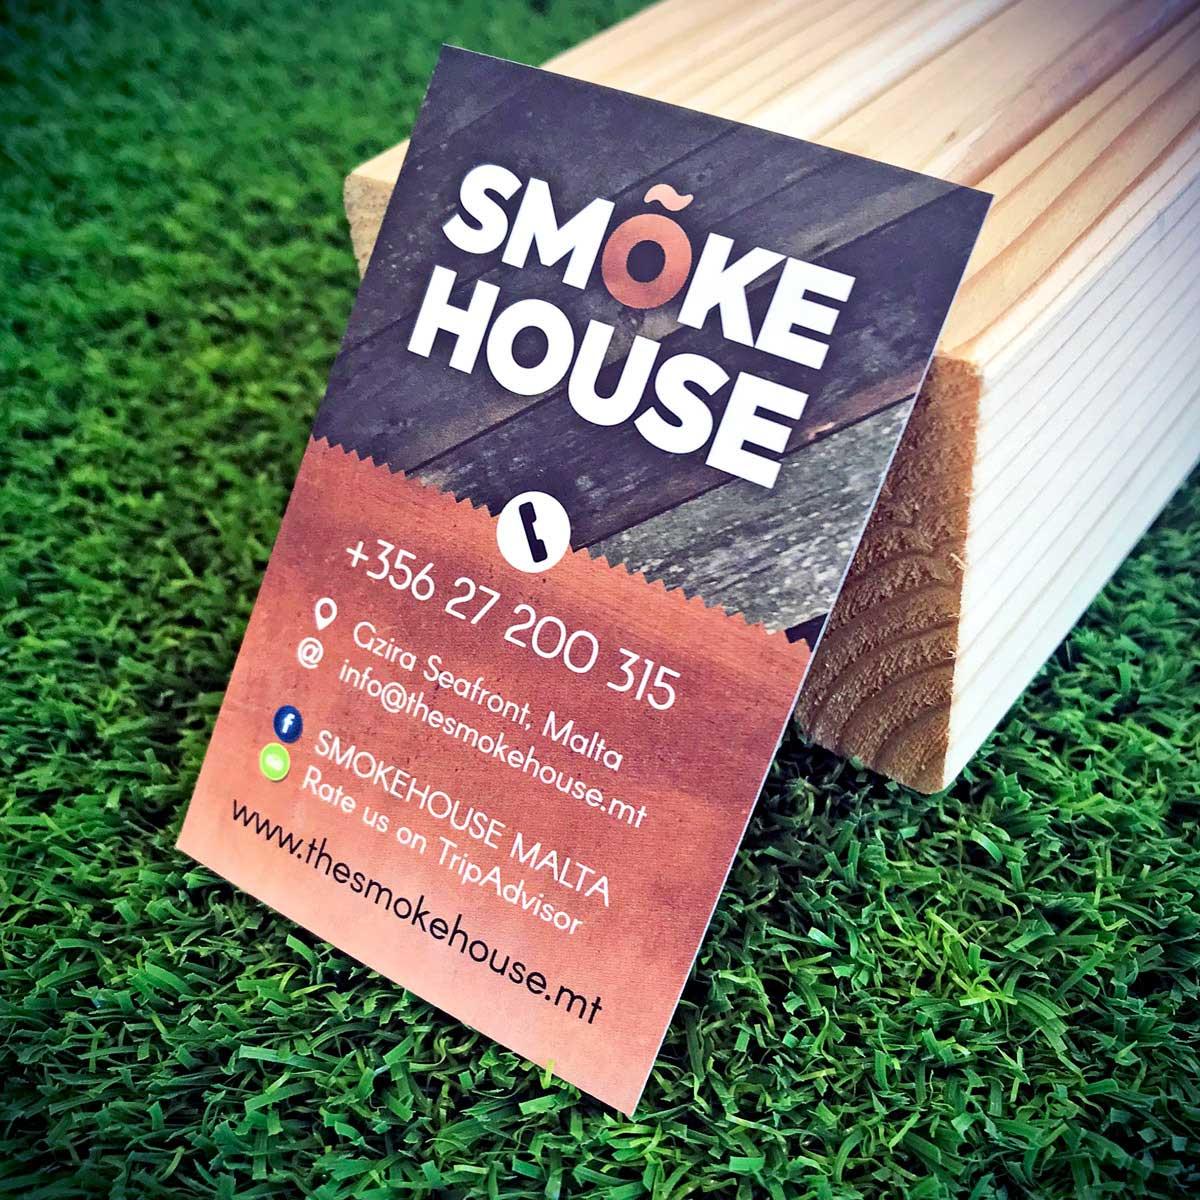 Business Cards - Smoke House